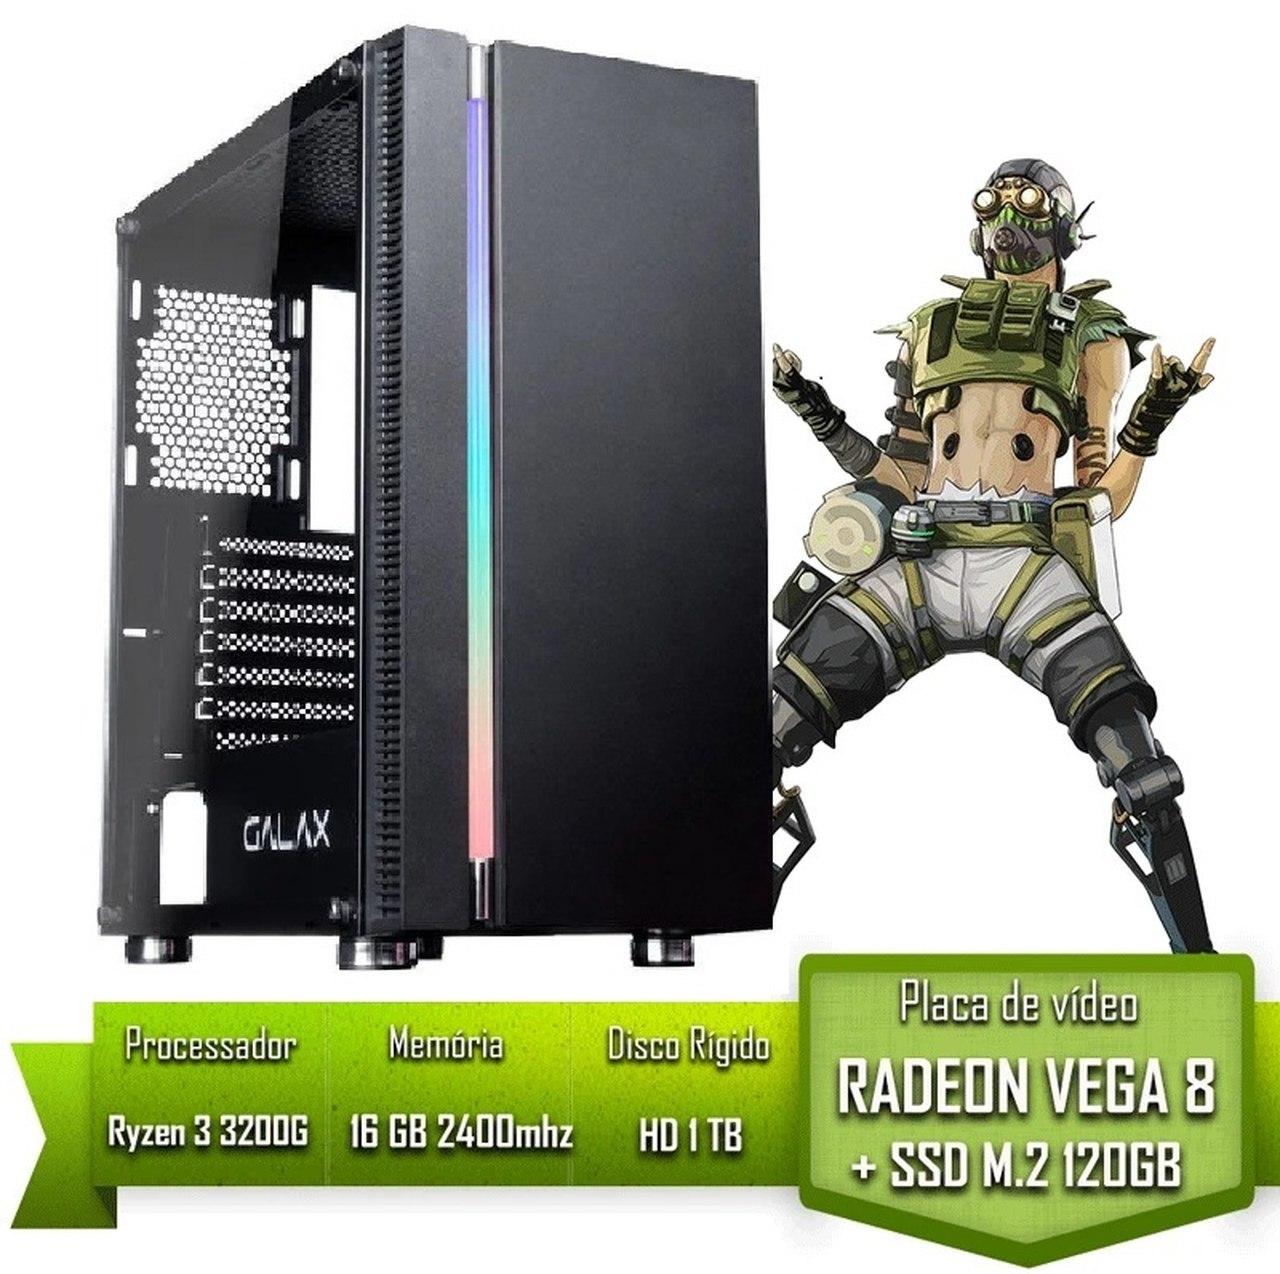 PC GAMER ALLIGATOR GAMING AMD RYZEN 3 3200G / 16GB 2400MHZ / SSD 120GB M.2 /HD 1TB